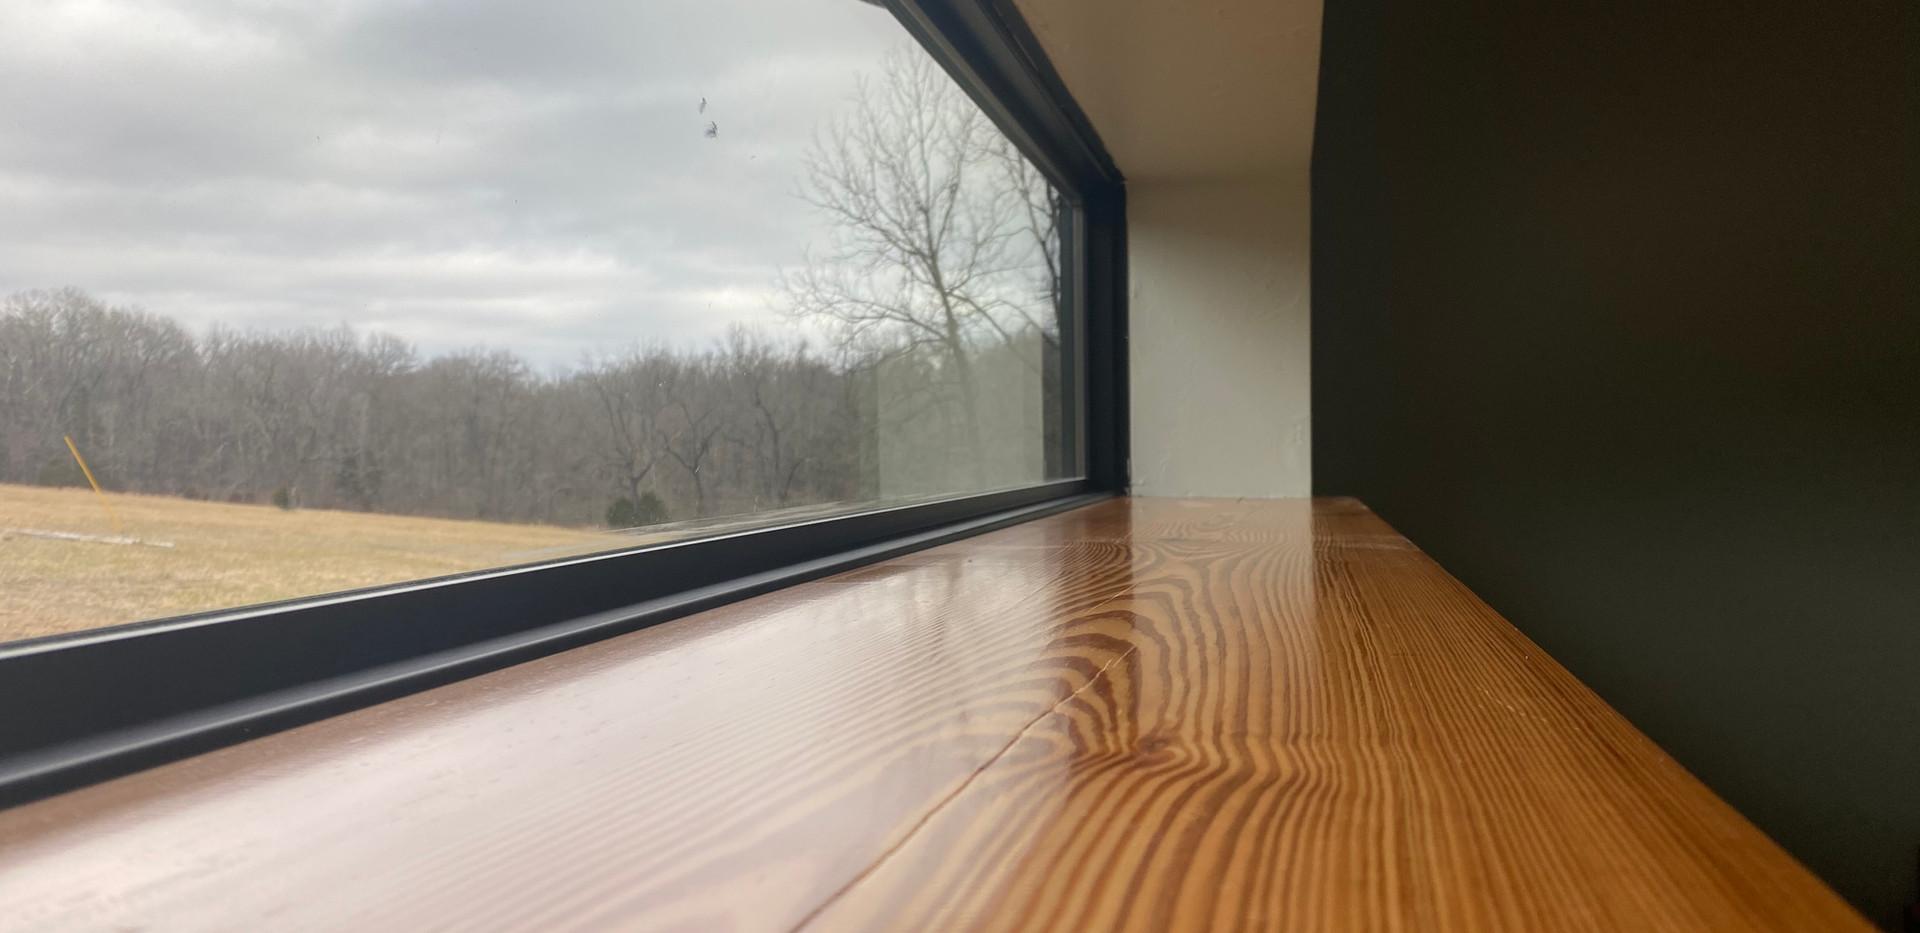 Reclaimed pine on window sills.